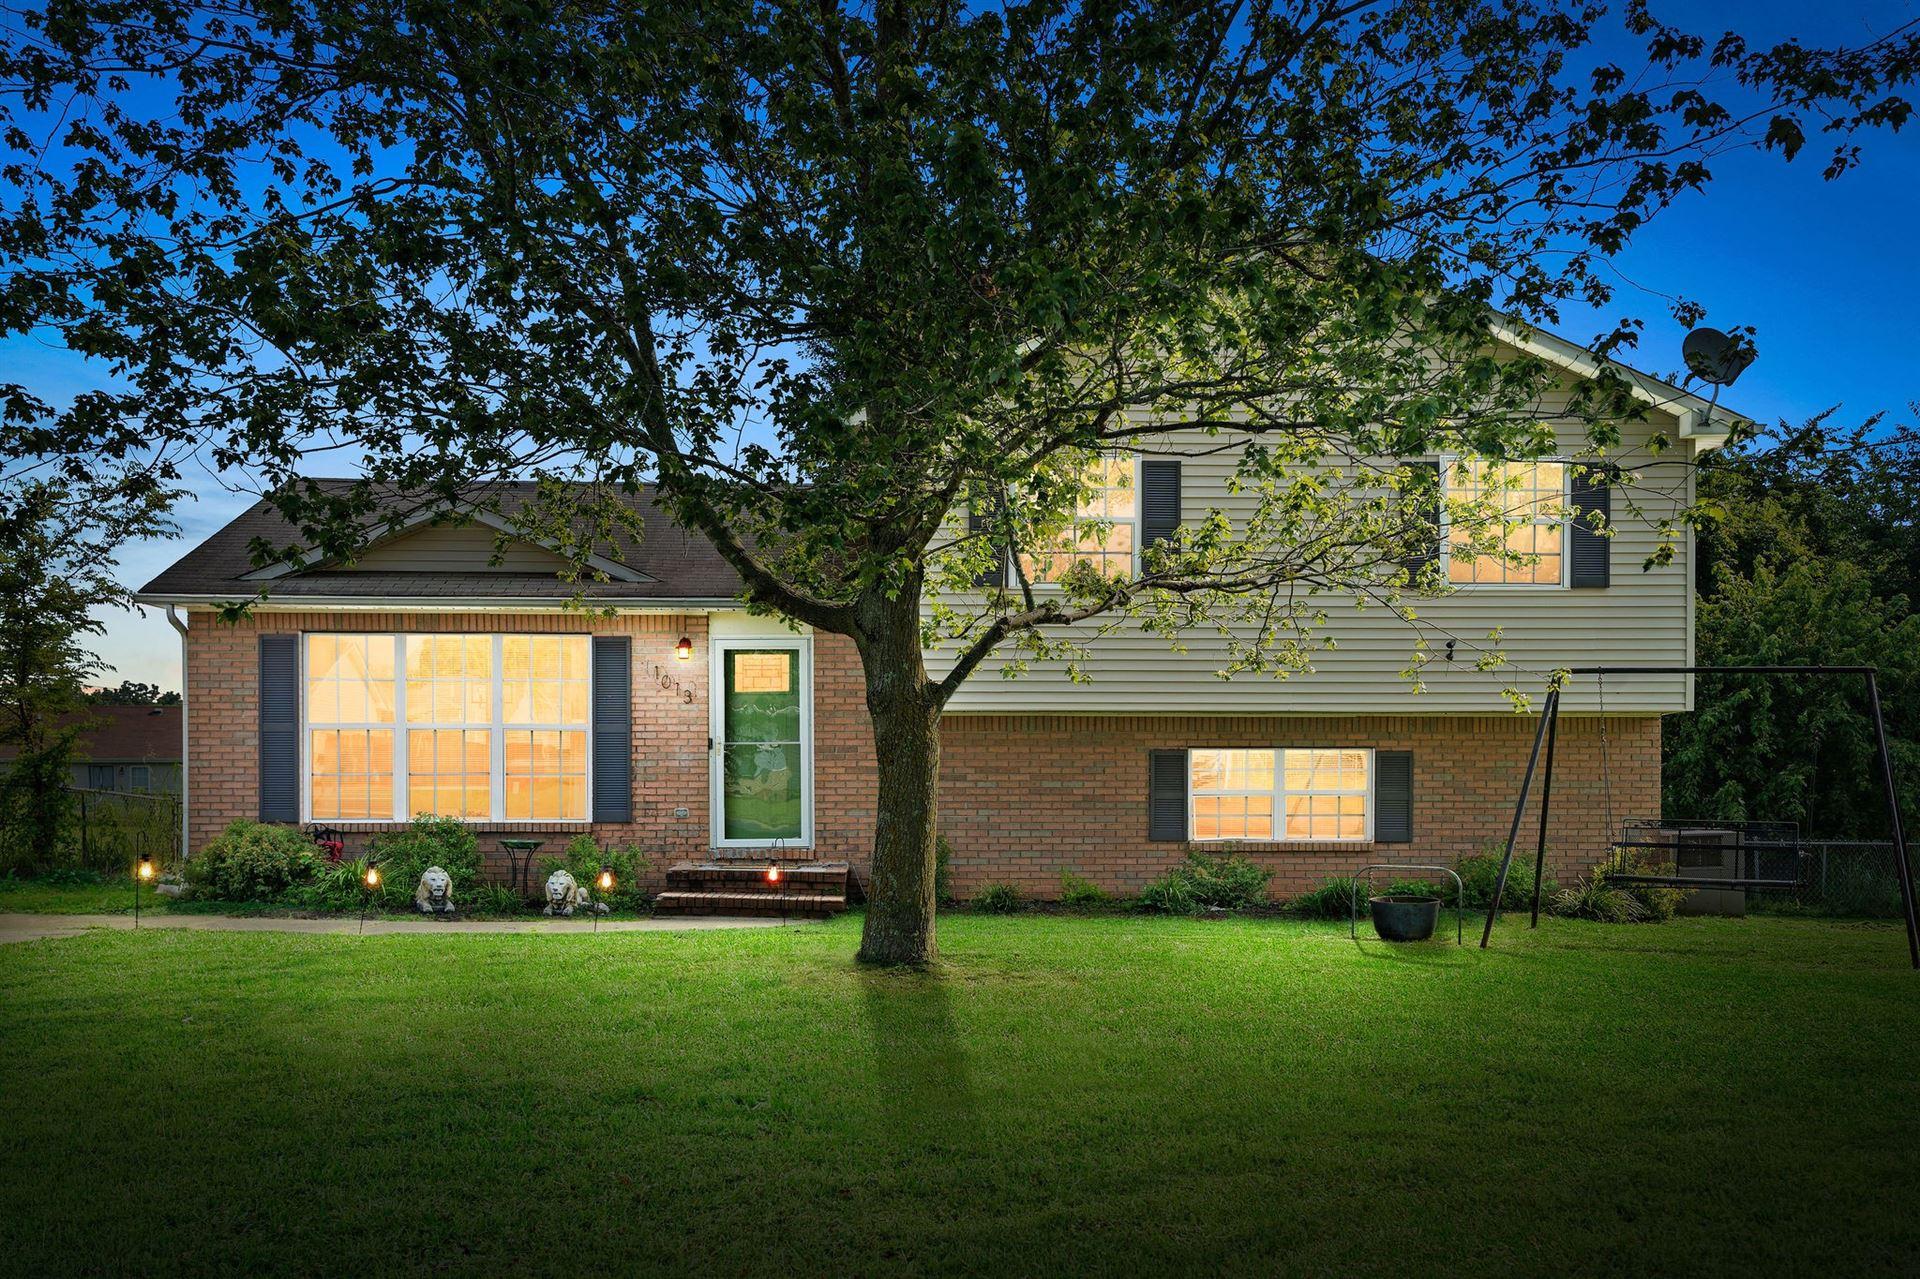 1013 Cooper Drive, Oak Grove, KY 42262 - MLS#: 2276258